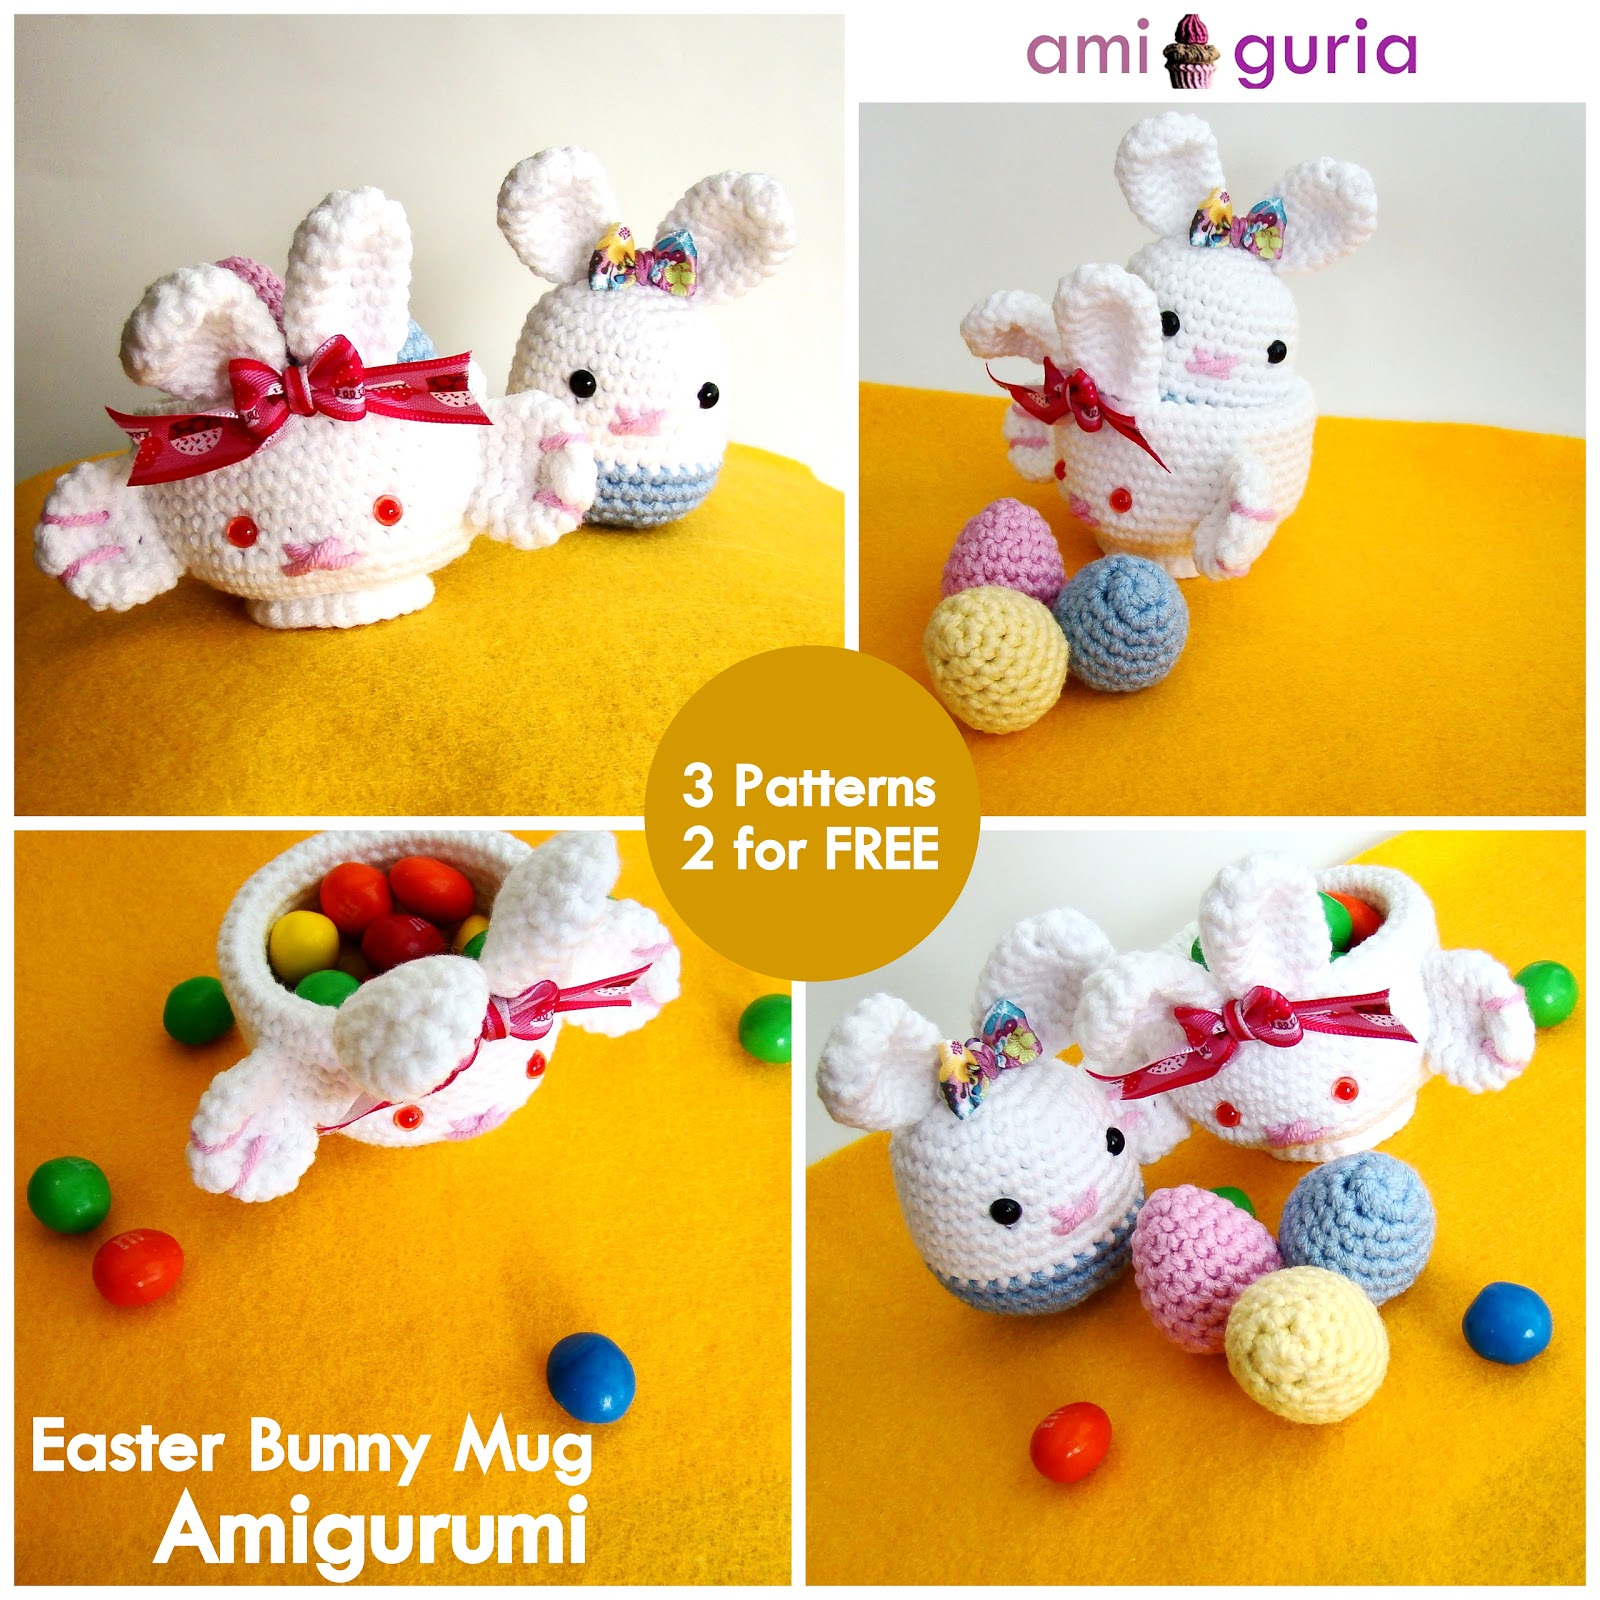 amiguria amigurumi: Easter Bunny Mug Amigurumi